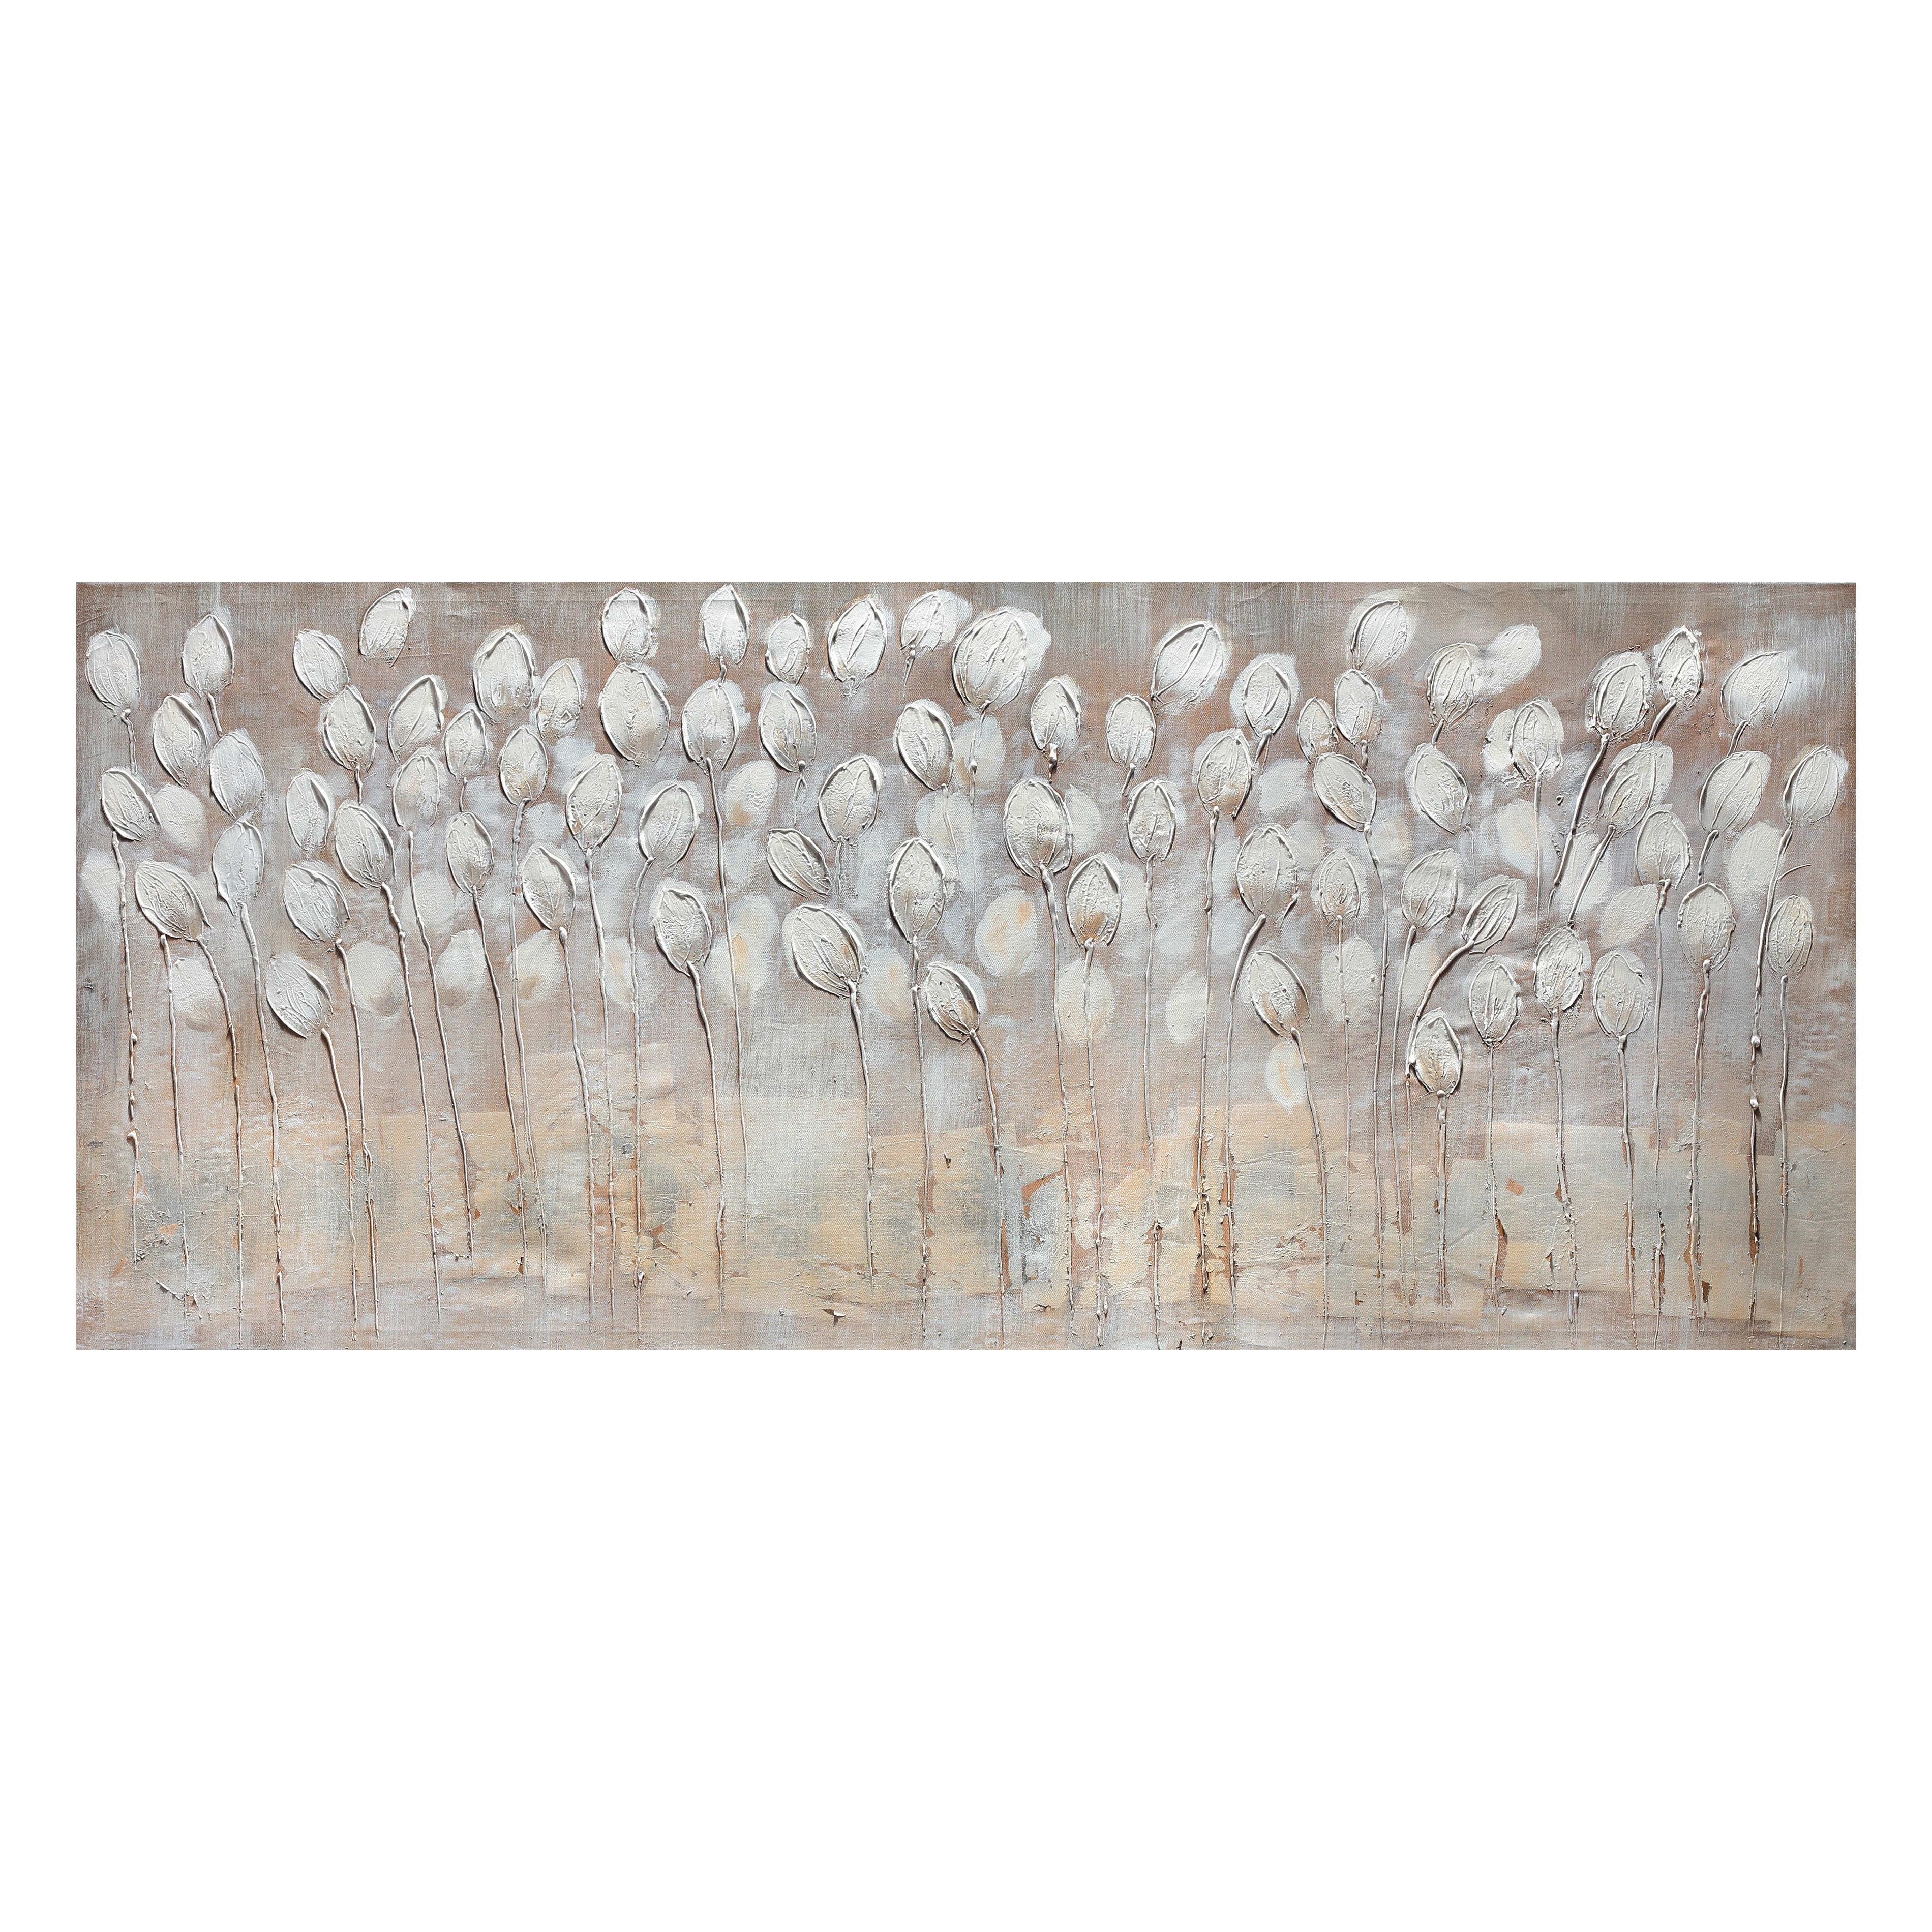 Quadri Cucina Leroy Merlin quadro dipinto a mano tulipani bianchi 150x65 cm